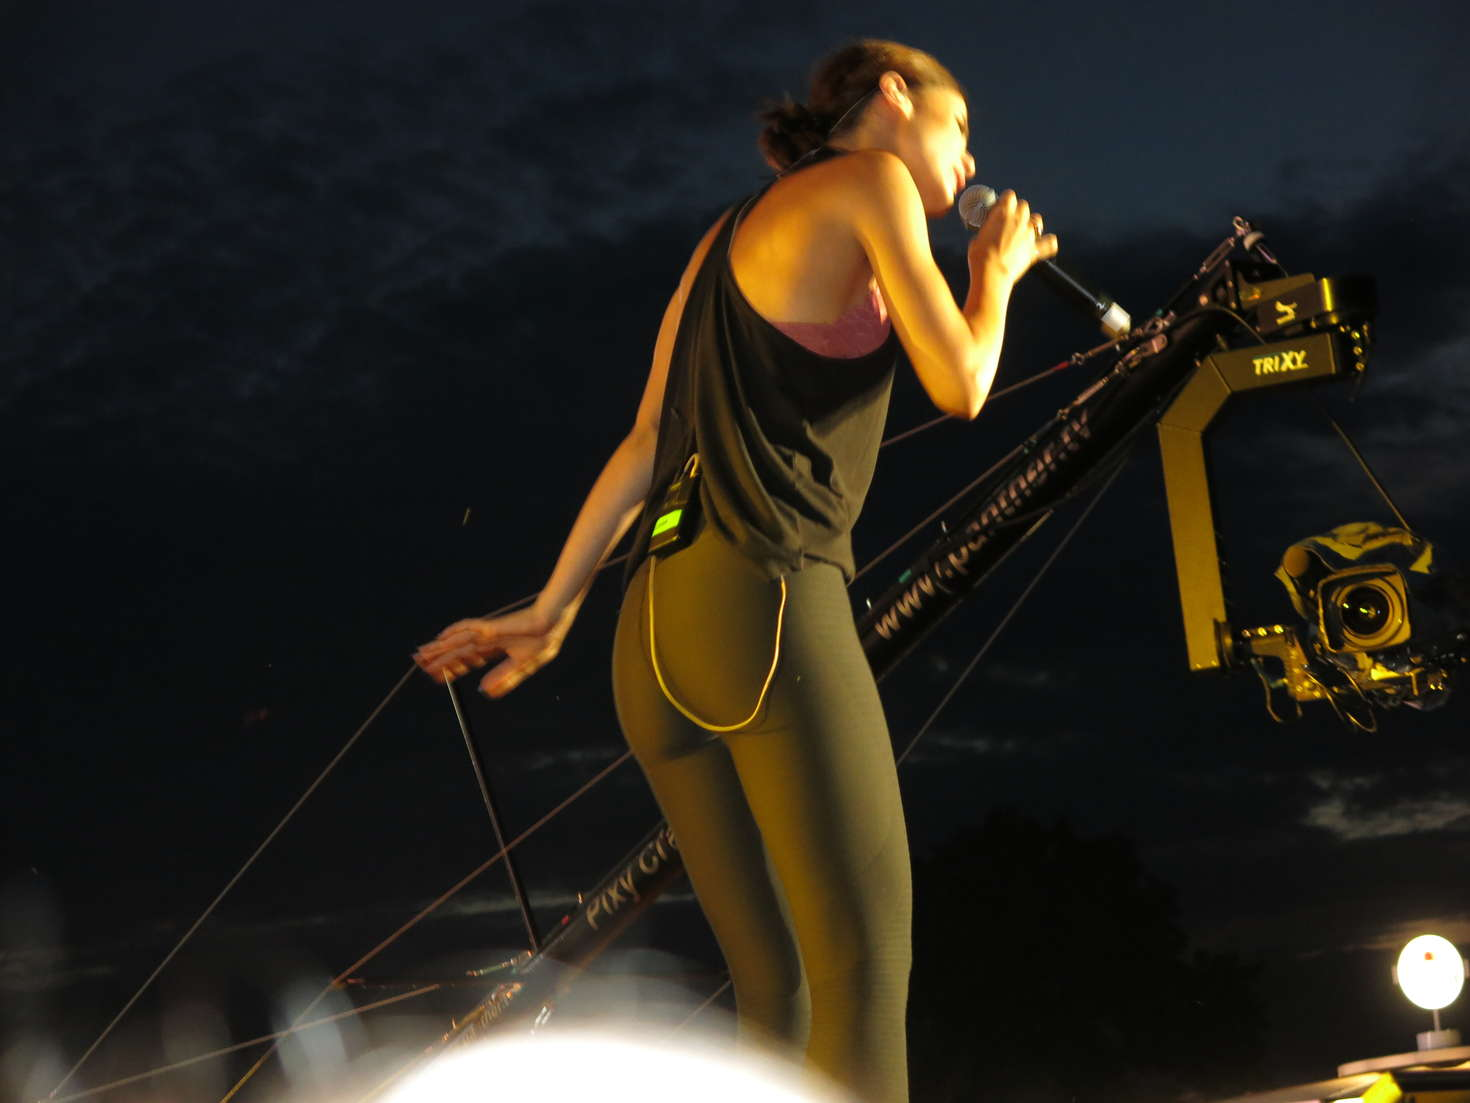 Miley cyrus vancouver concert 2014